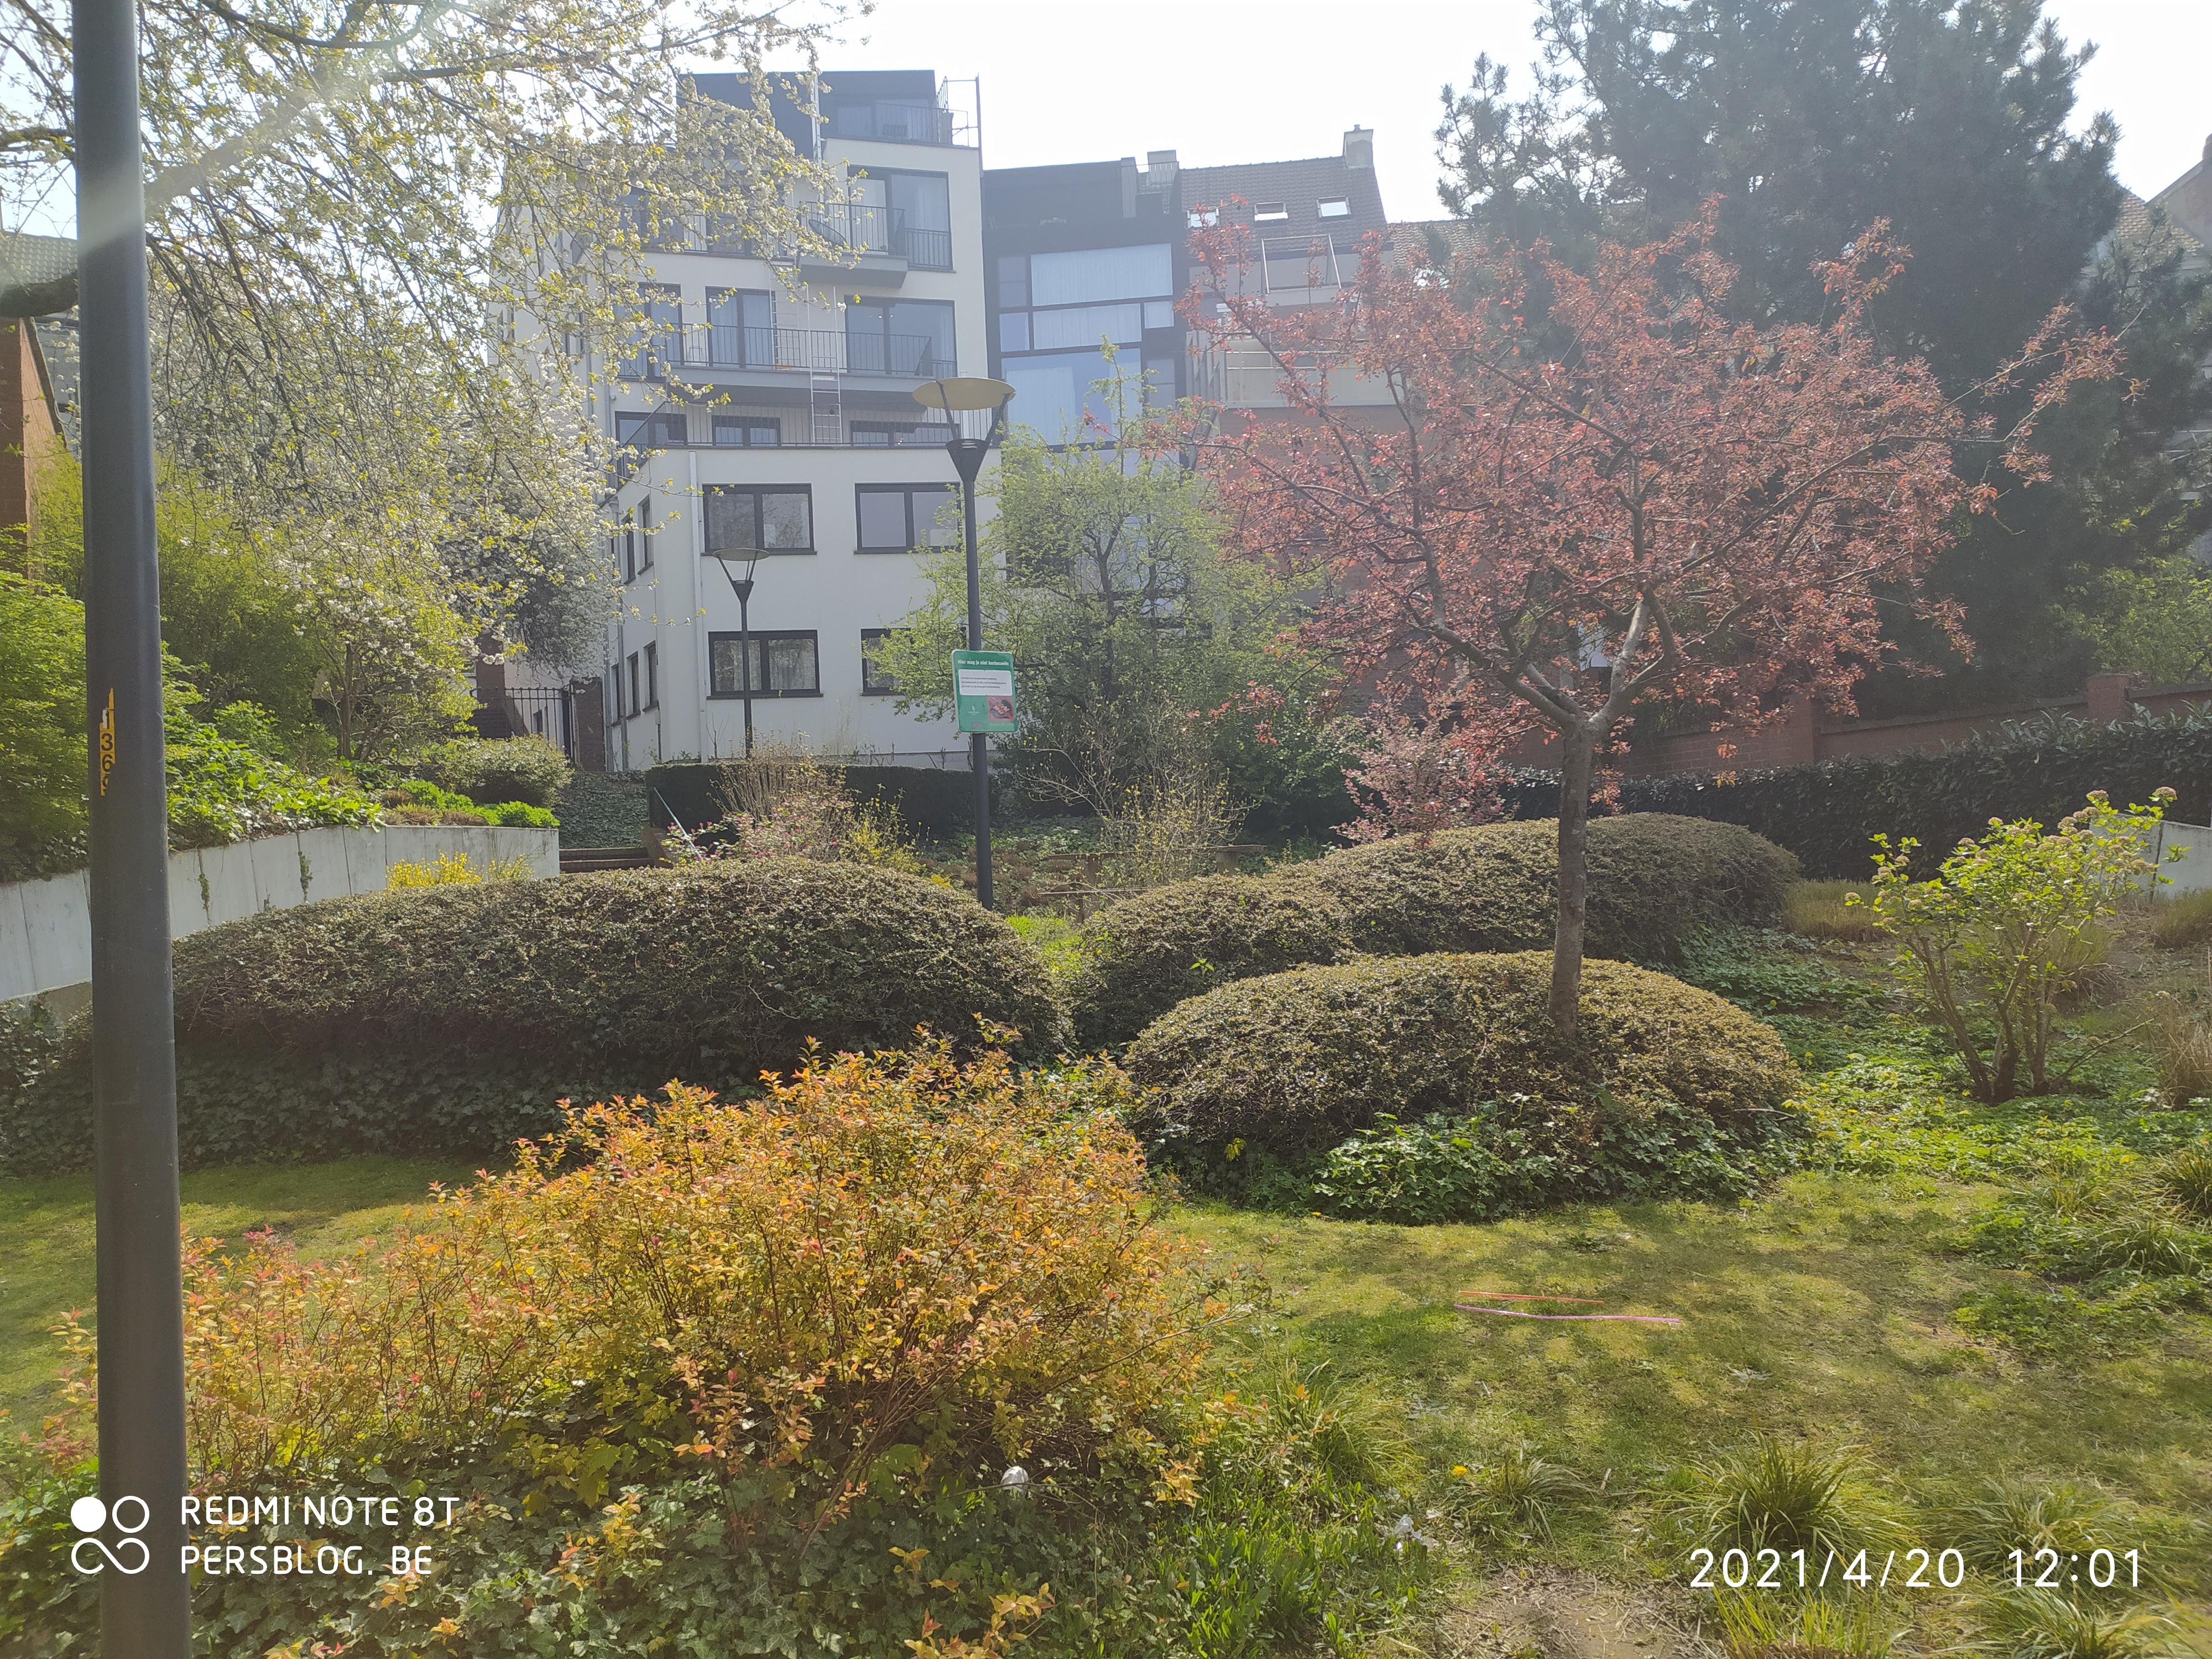 22 Veergrep - zijstraat Kortrijksepoortstraat - publieke buurtuin - Leie IMG_20210420_120442 (5)